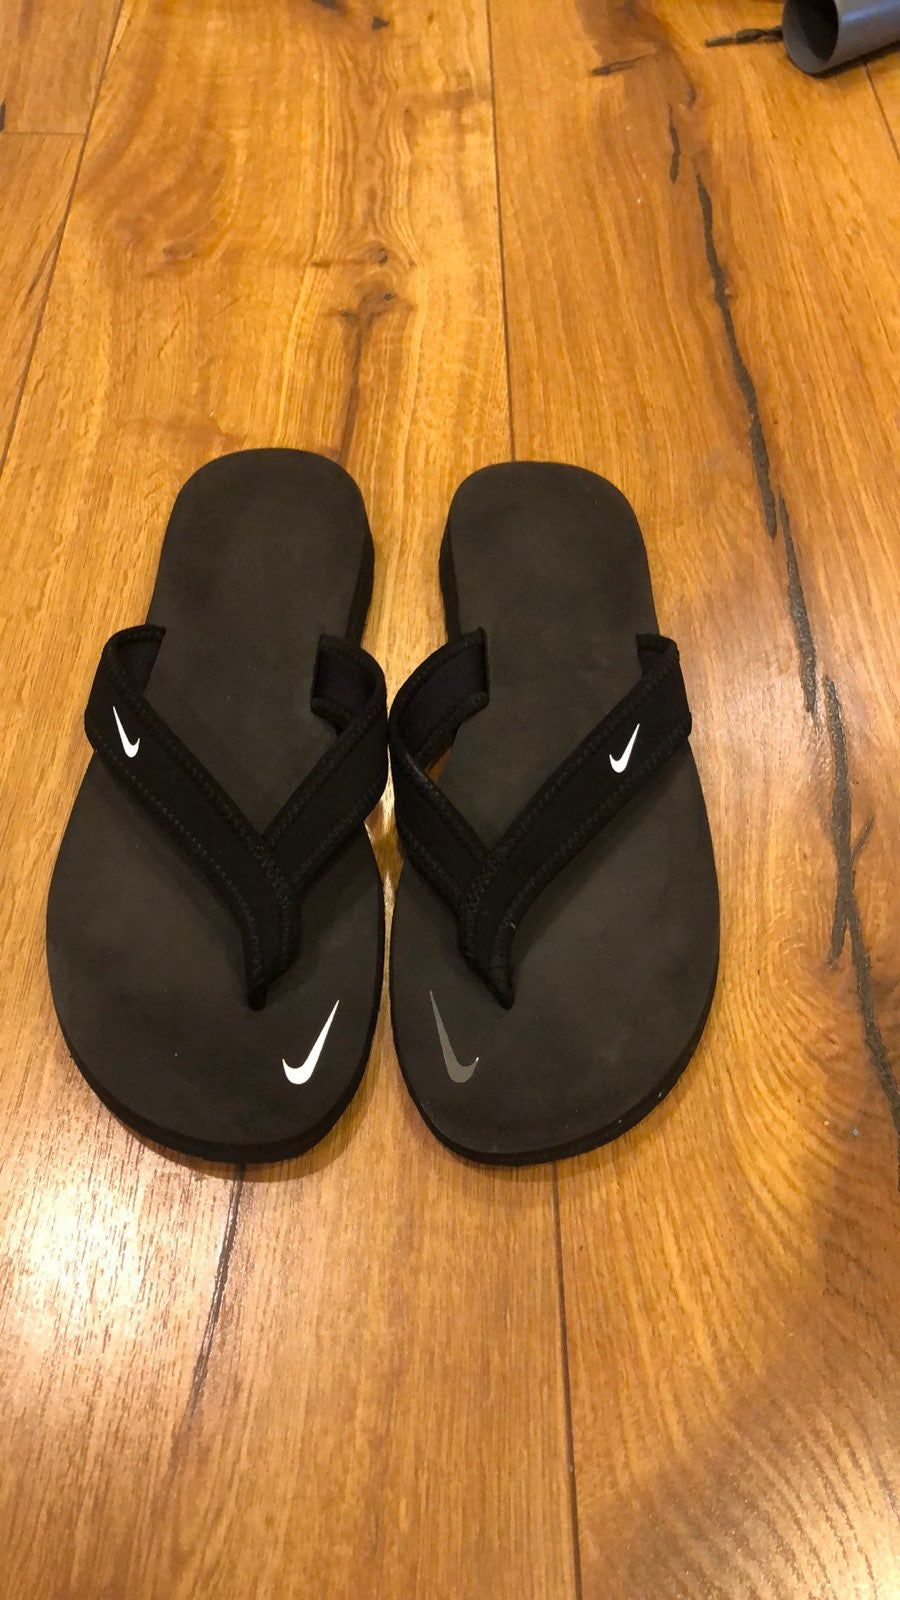 Nike flip flops, Flip flops, Nike sandals